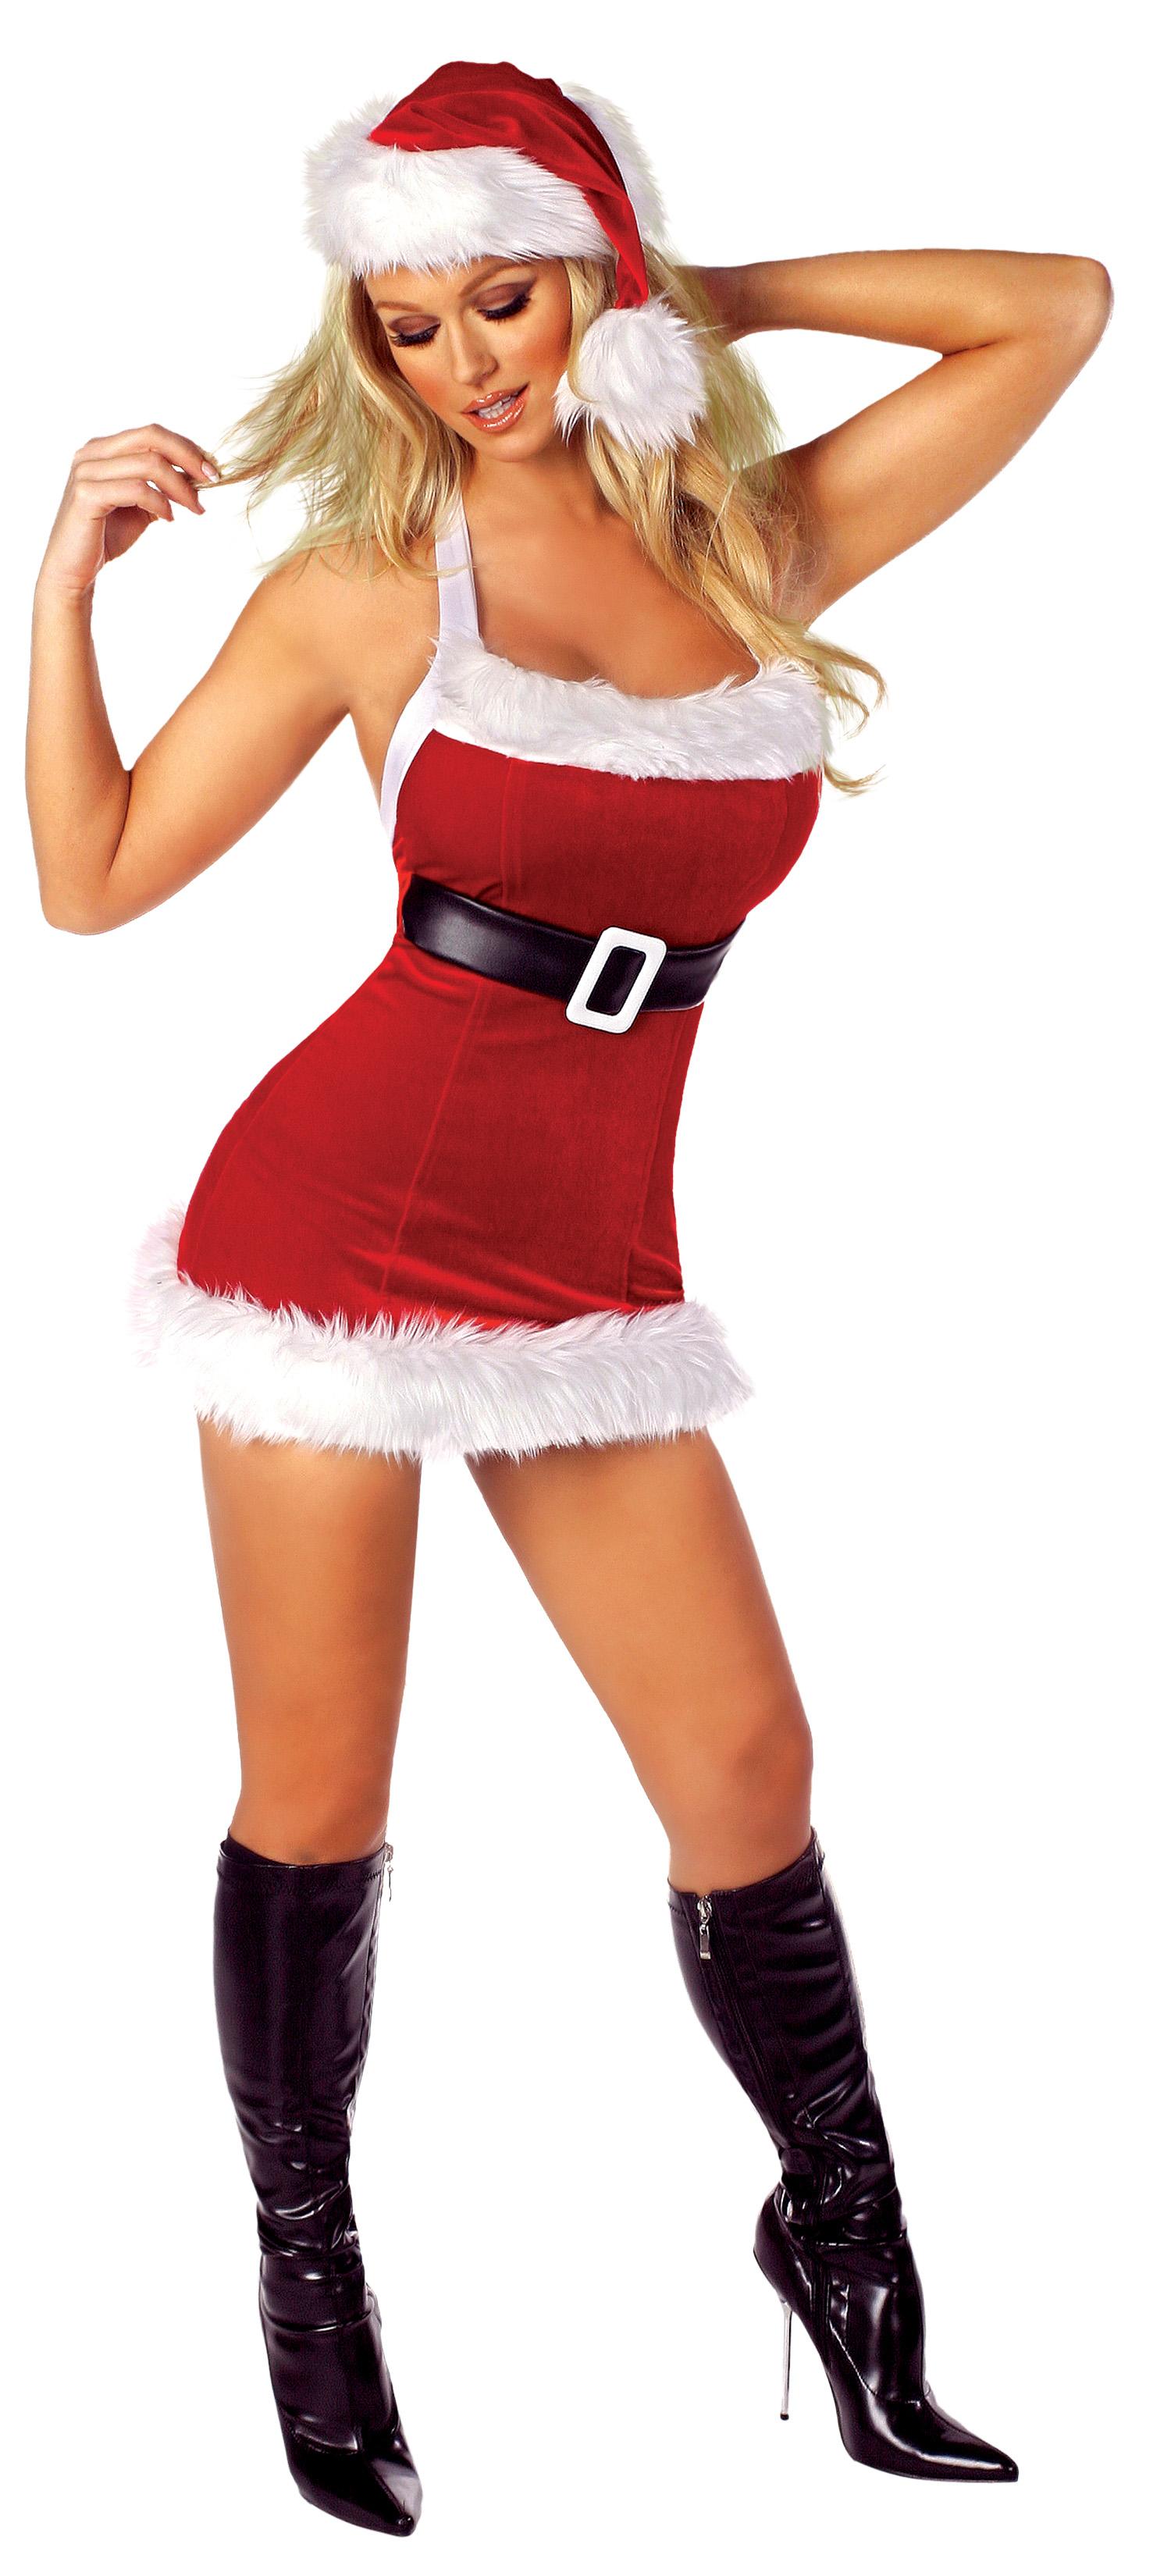 Sexy elf outfit porn erotica image